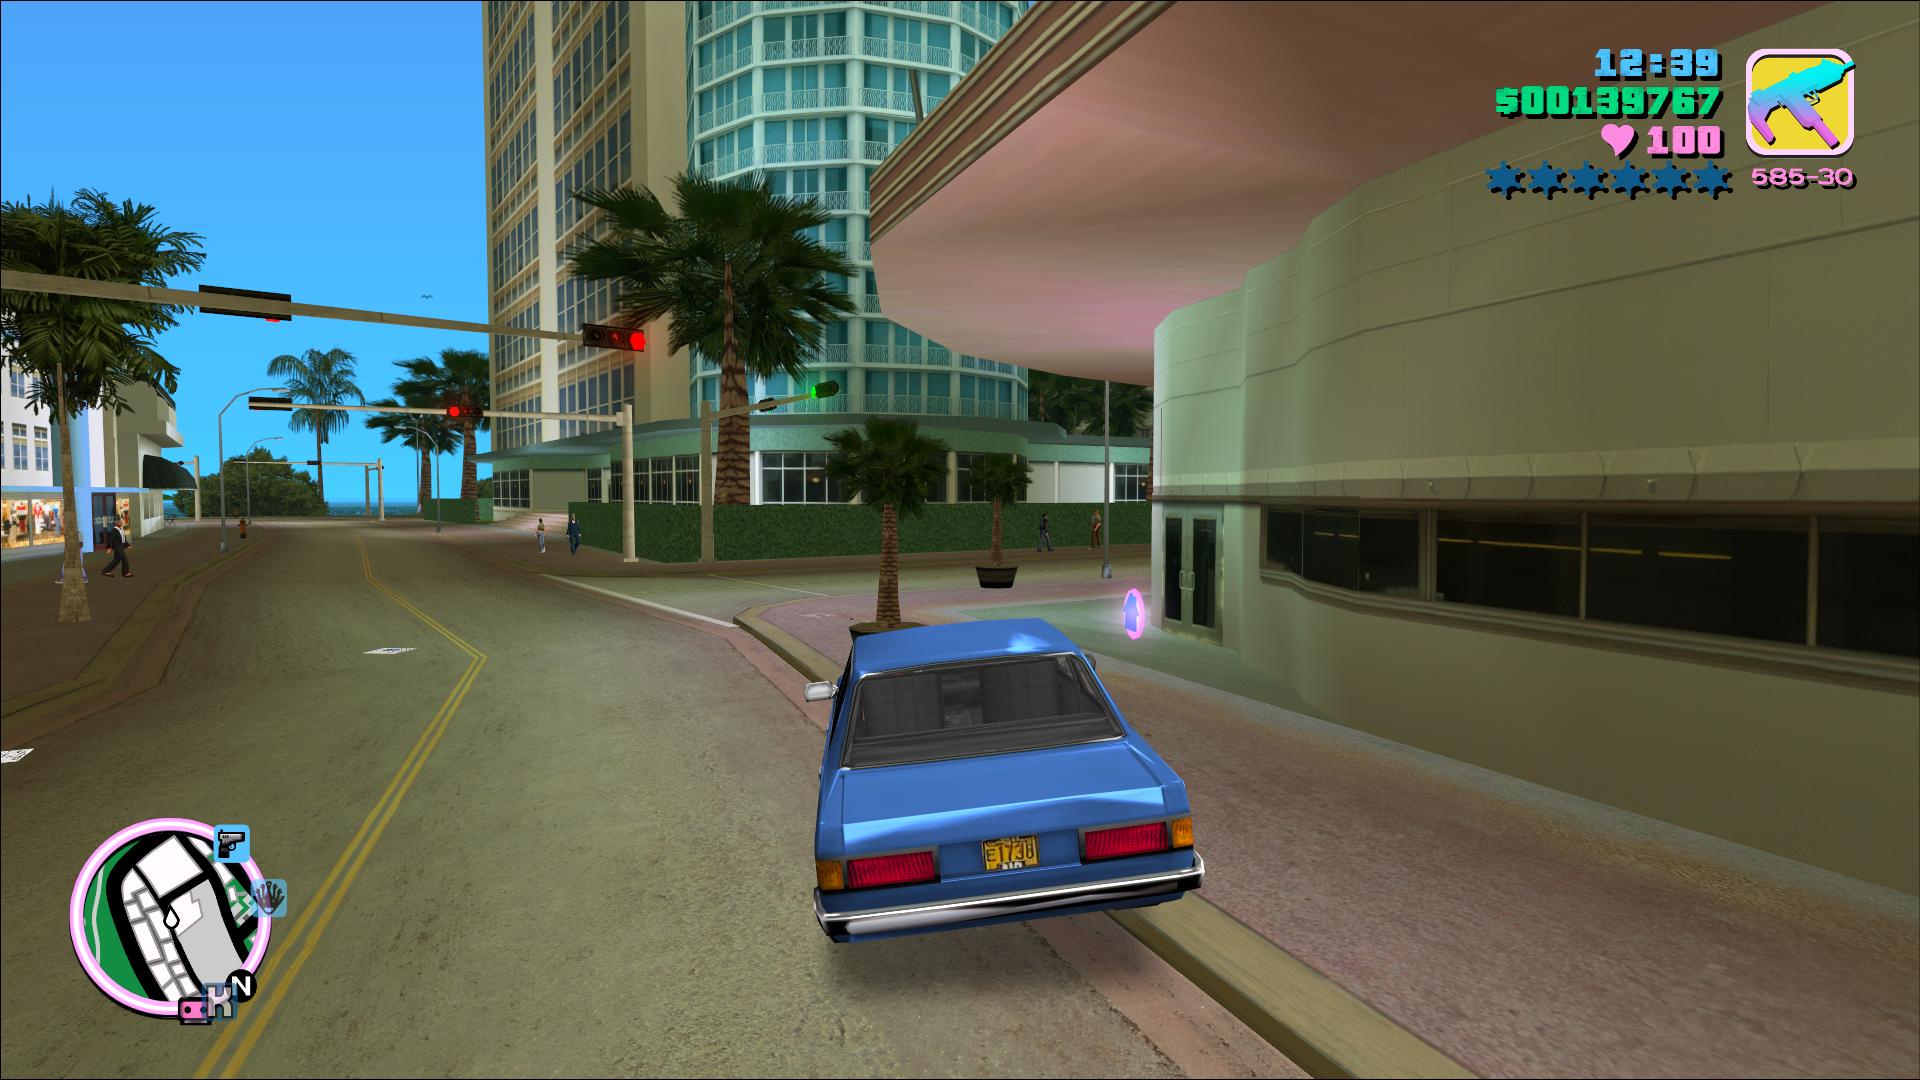 Grand_Theft_Auto_Vice_City_Screenshot_20